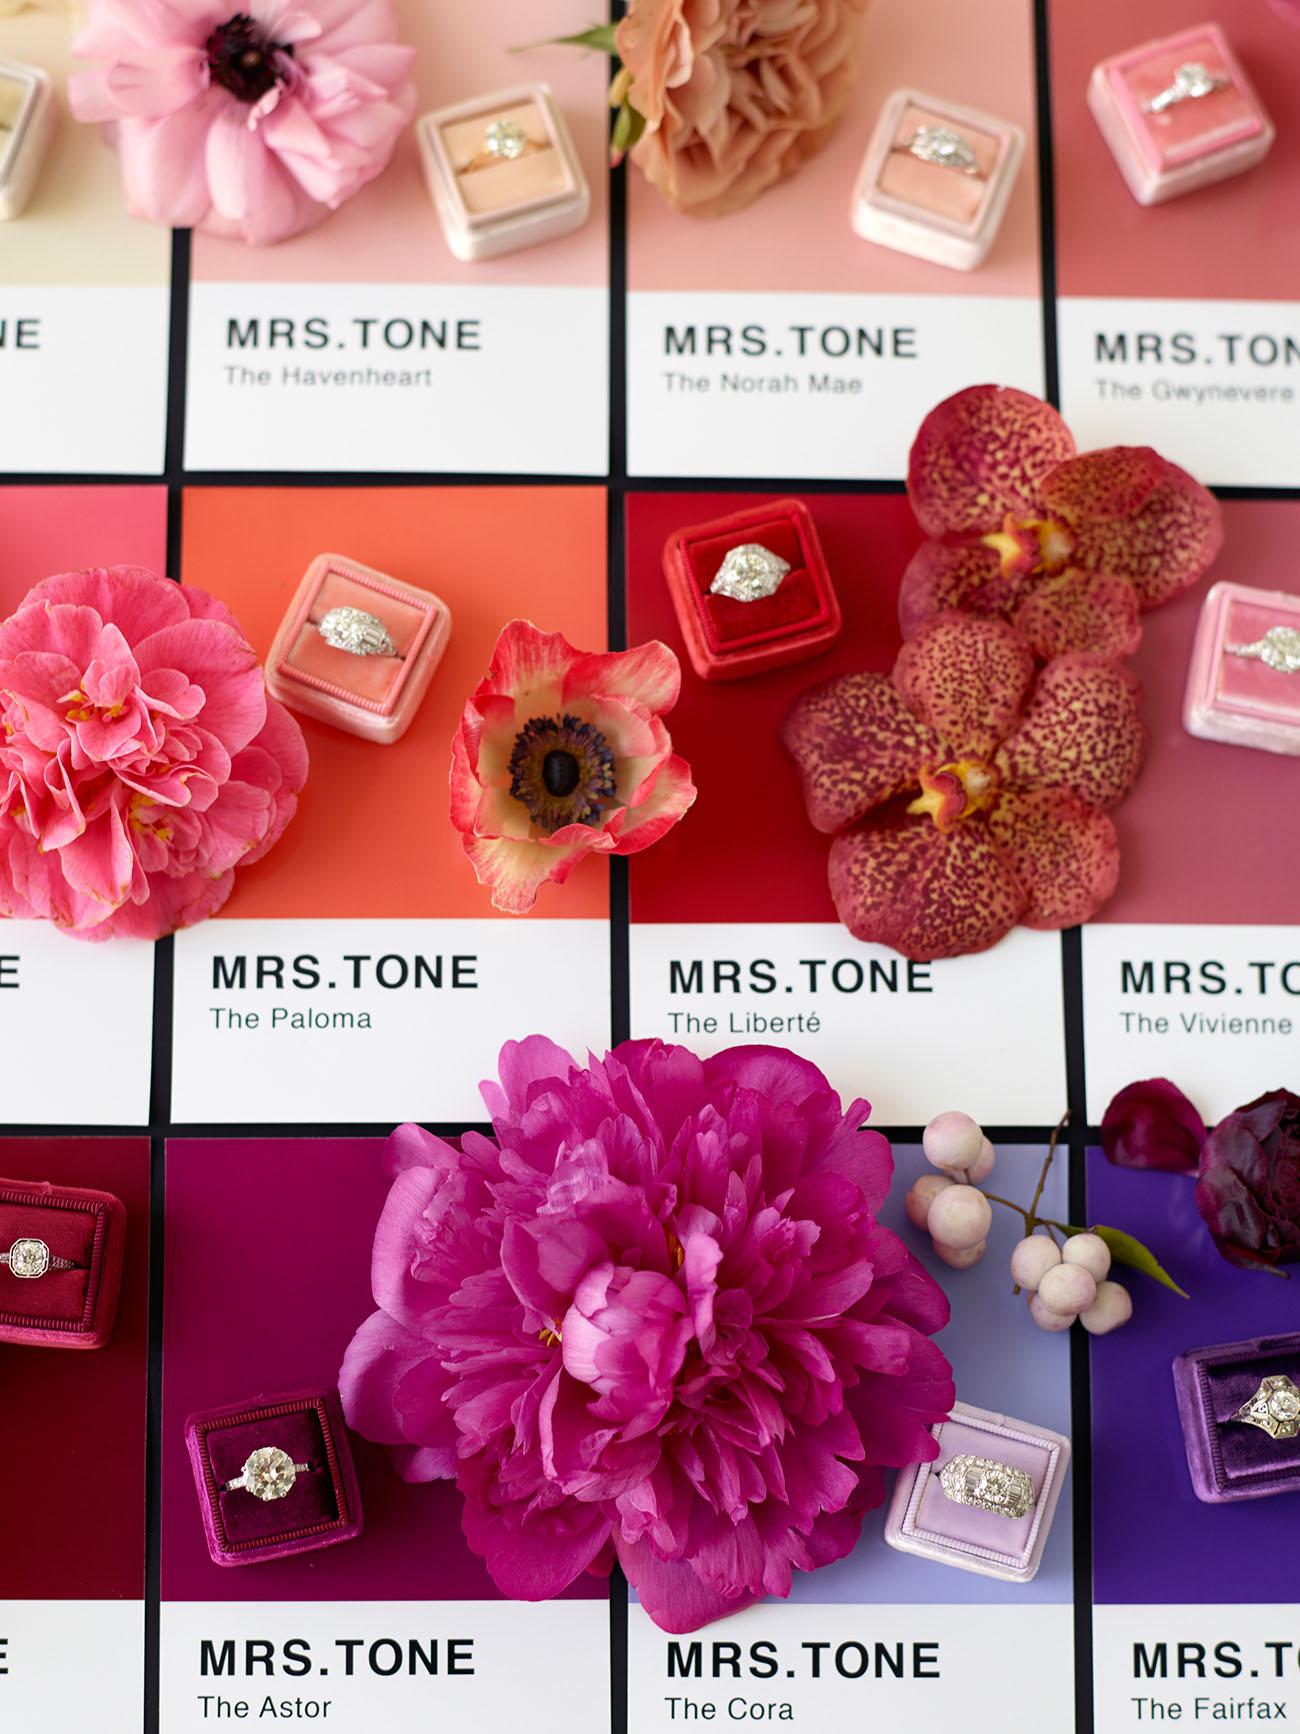 The Mrs Box